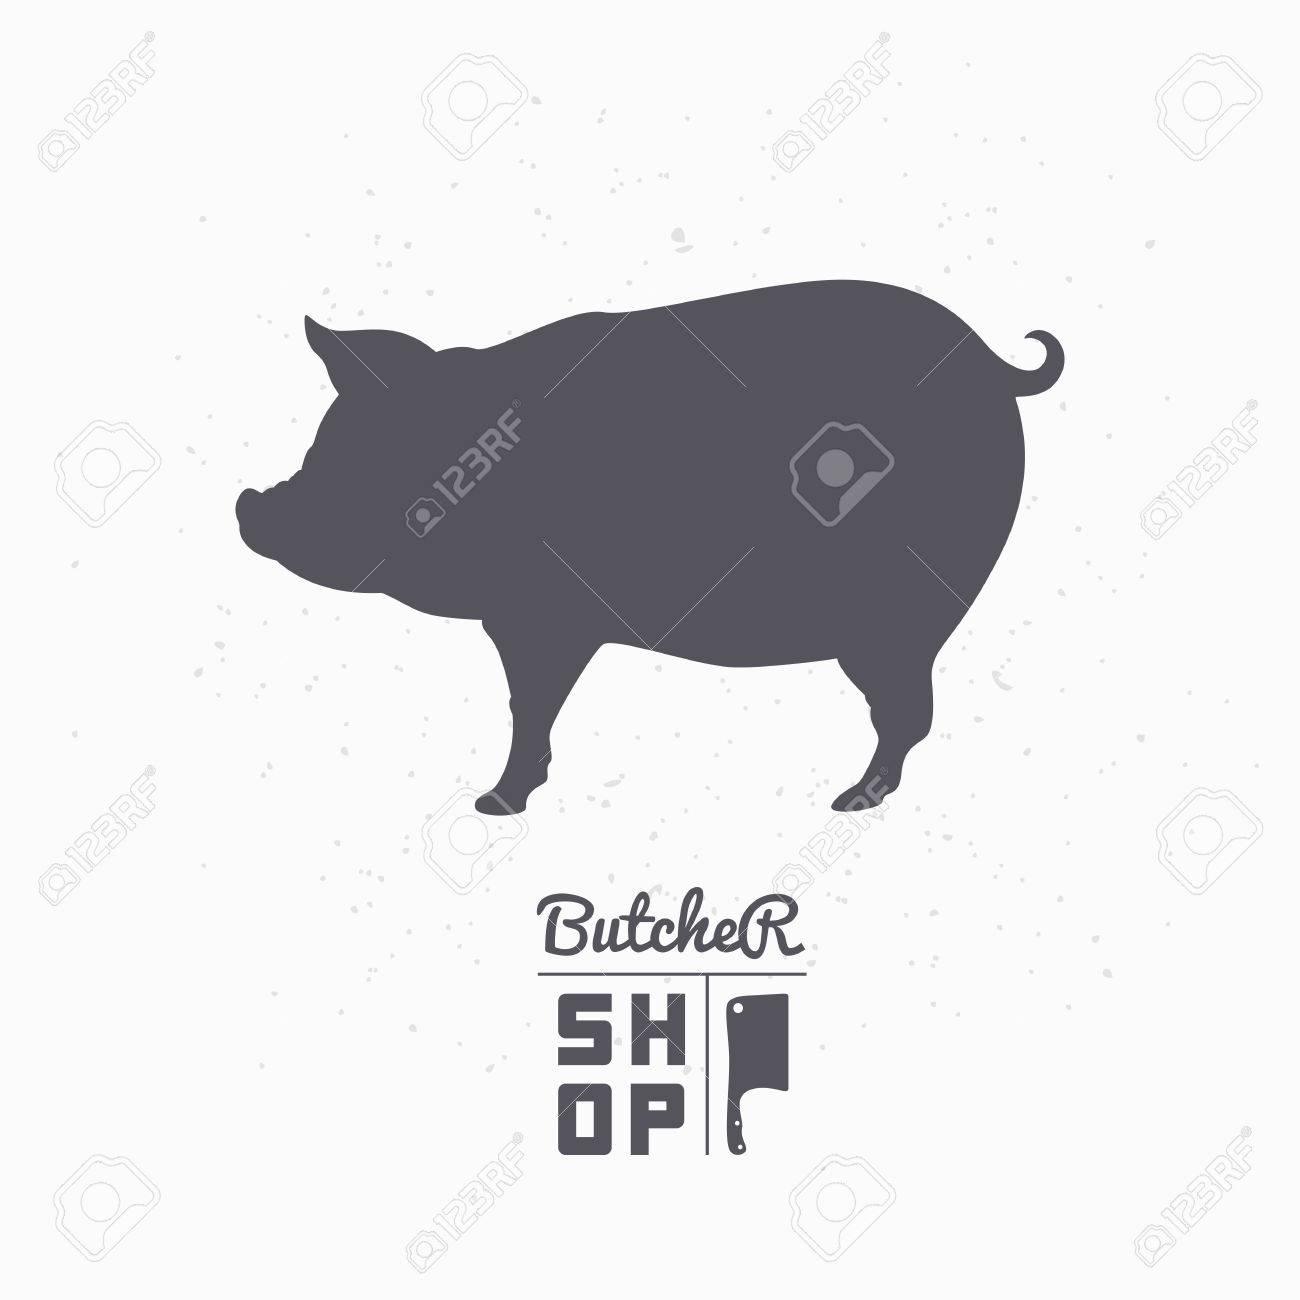 Pig Silhouette Pork Meat Butcher Shop Template For Craft Food Packaging Or Restaurant Design